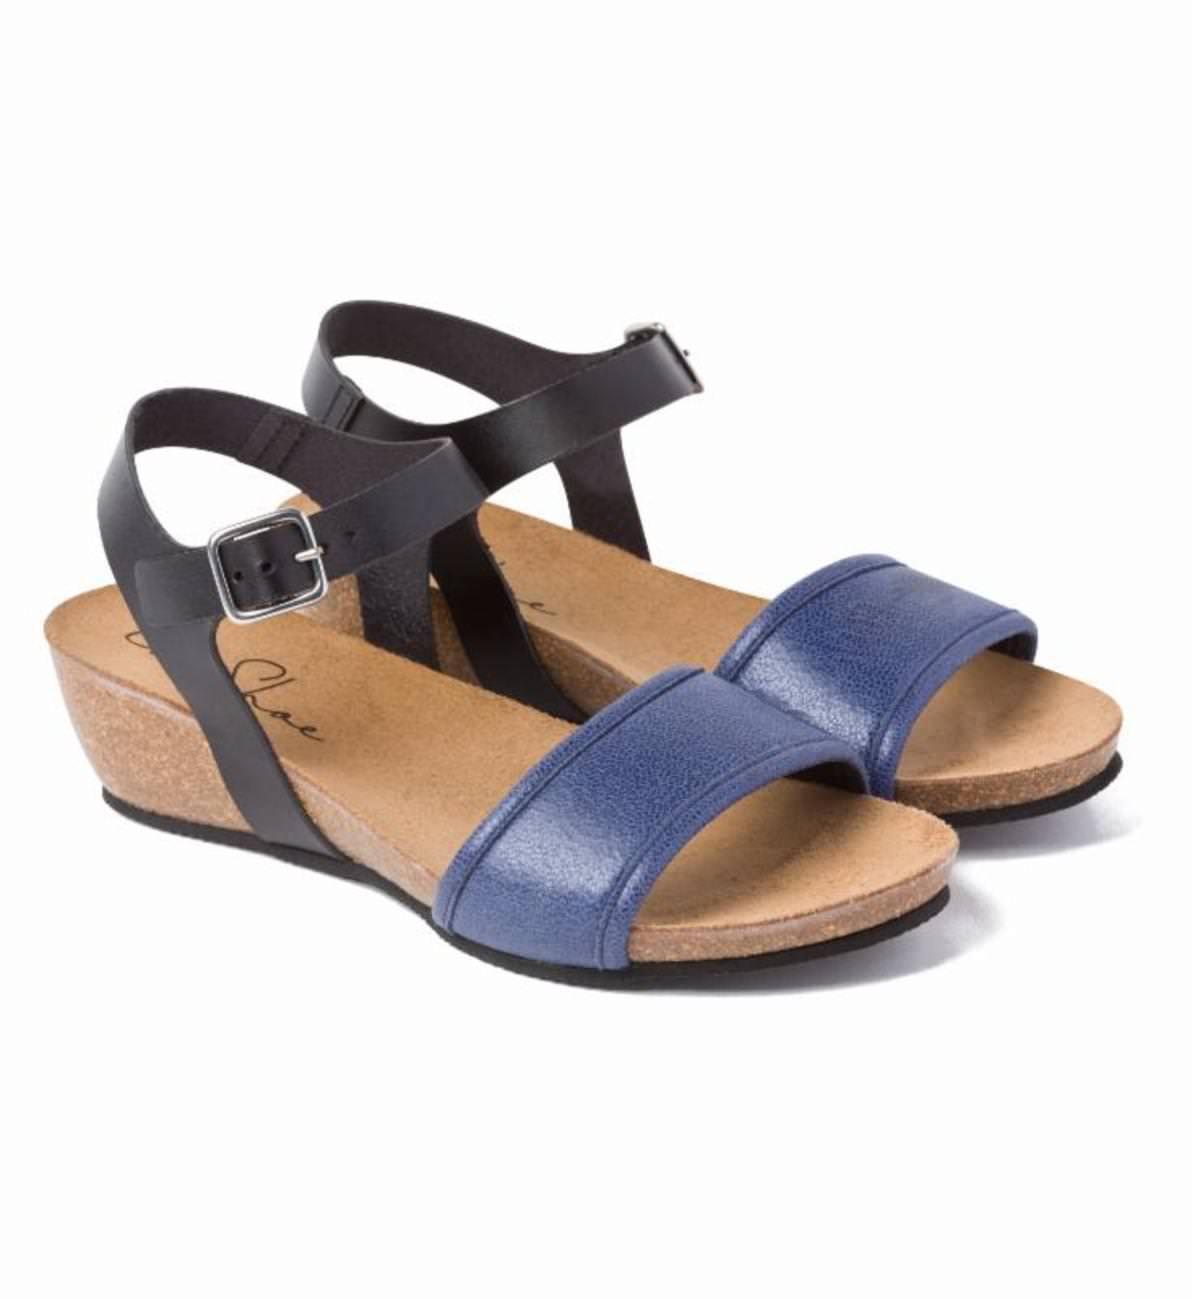 Sandale Schwarz/Blau LaShoe